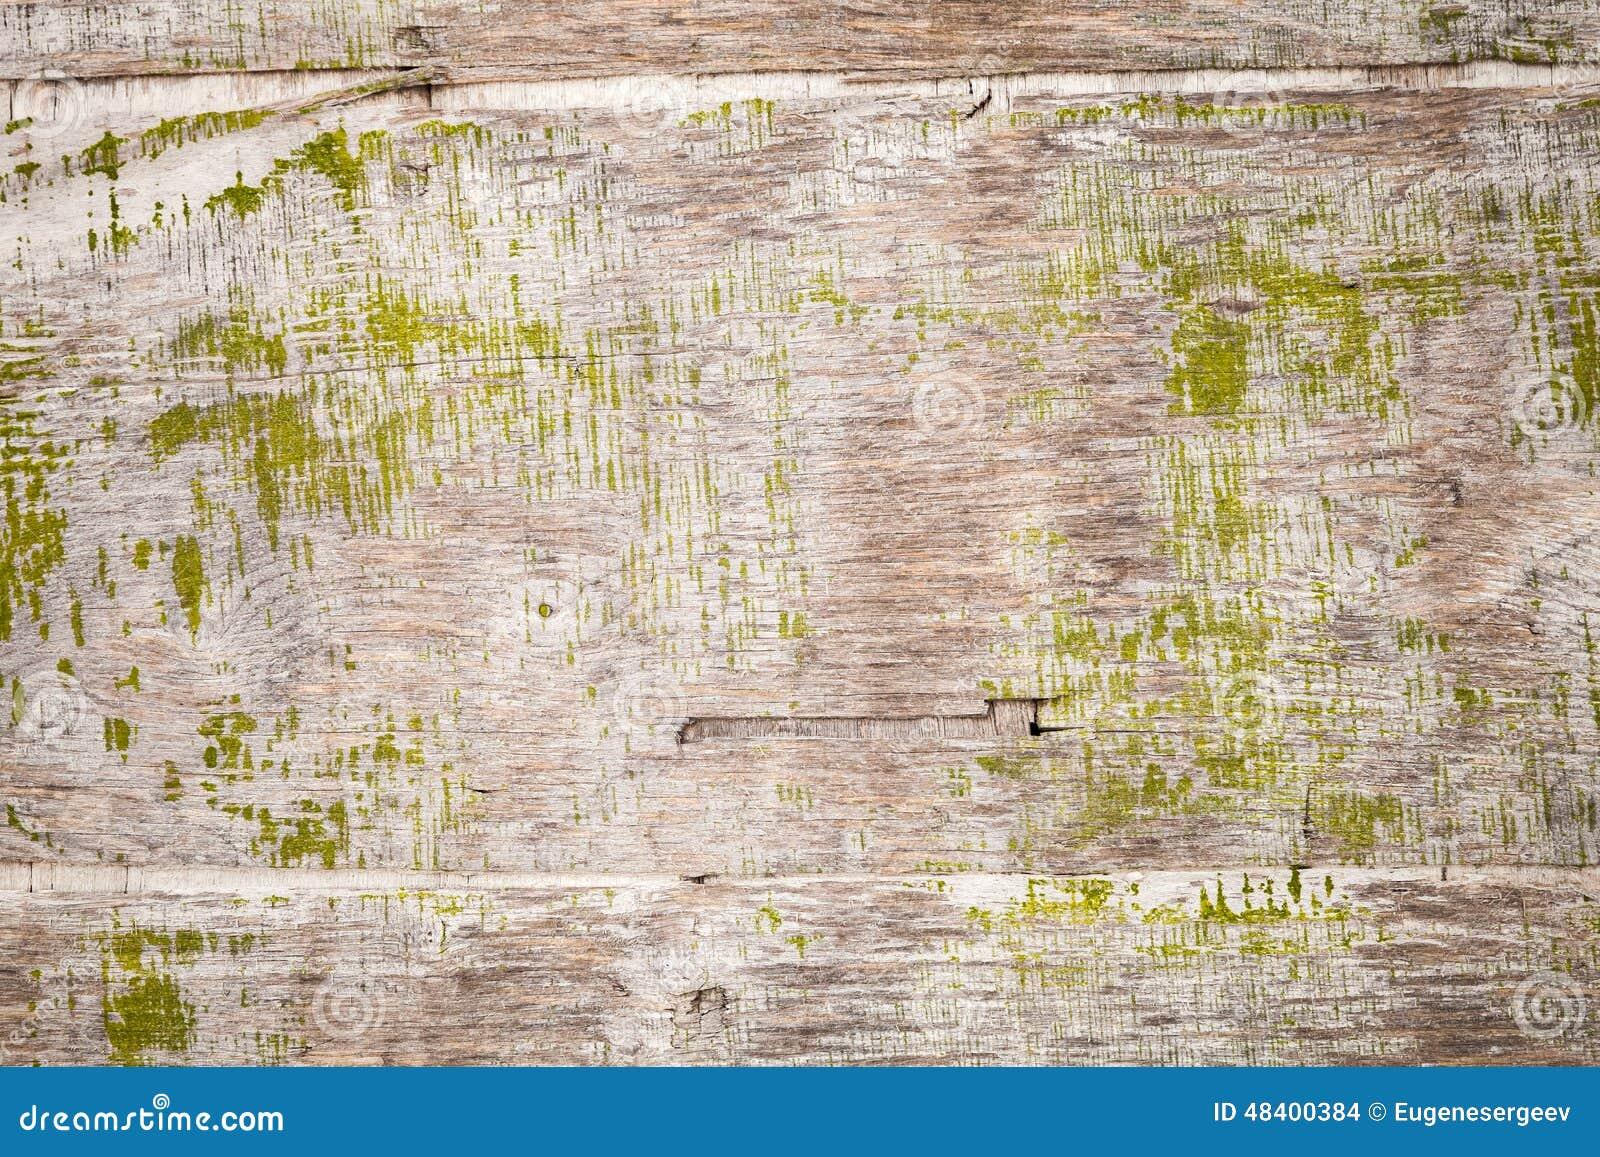 Oud grungy triplex met groene verf, achtergrondtextuur